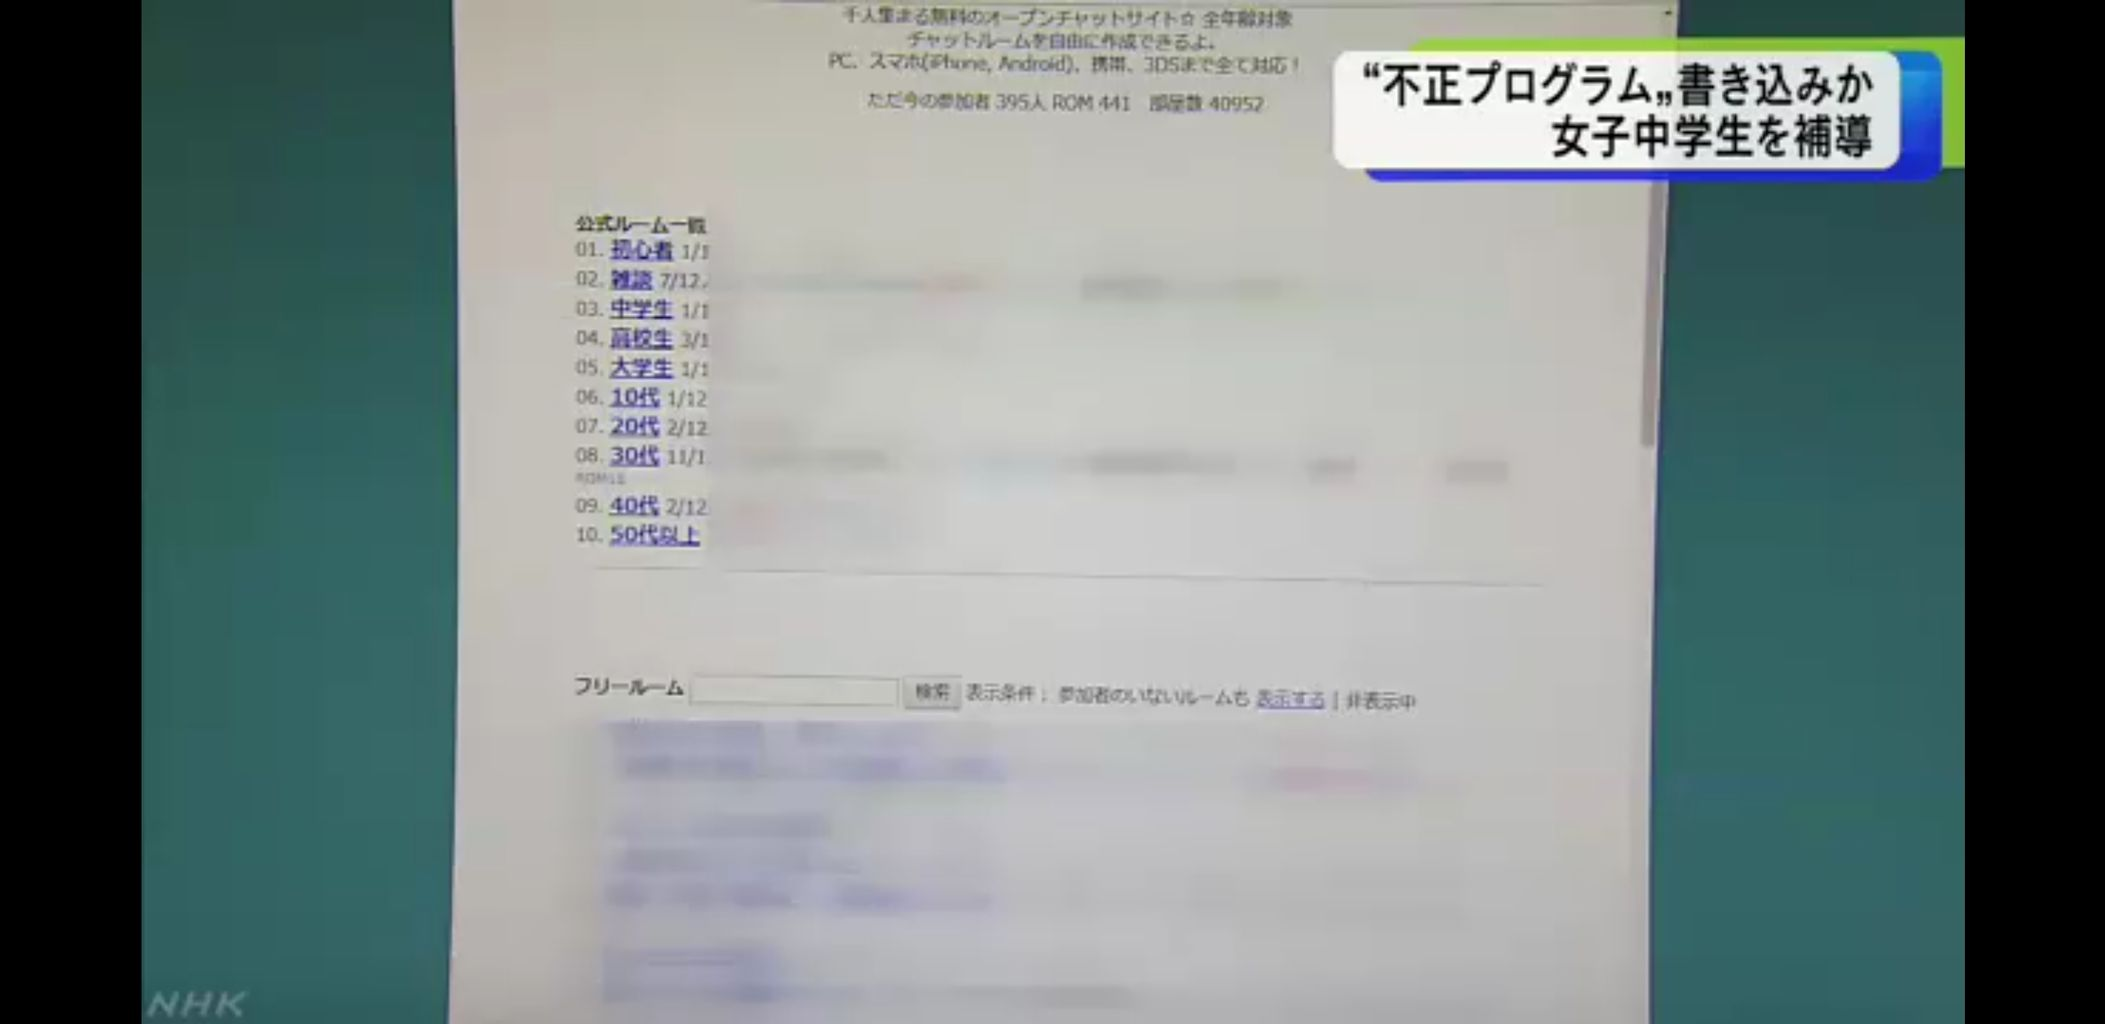 https://livedoor.blogimg.jp/michaelsan/imgs/4/b/4b7ce363.jpg